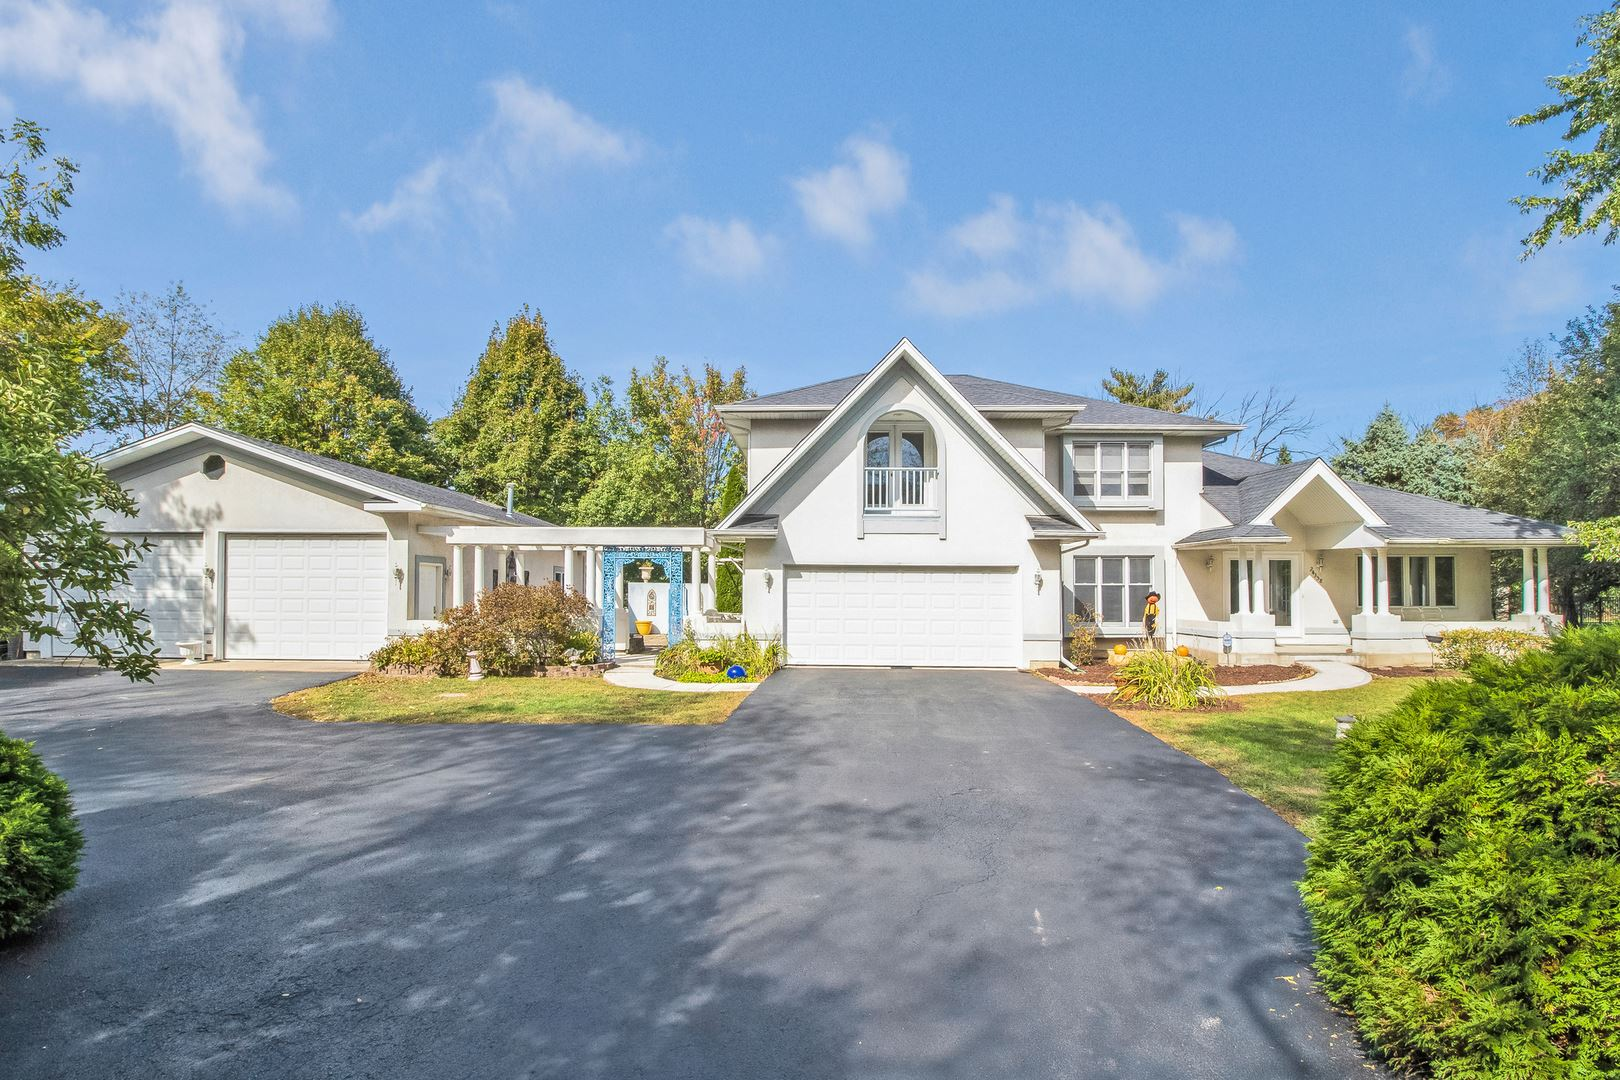 Photo of 24358 Schubert Lane, Shorewood, IL 60404 (MLS # 10893919)